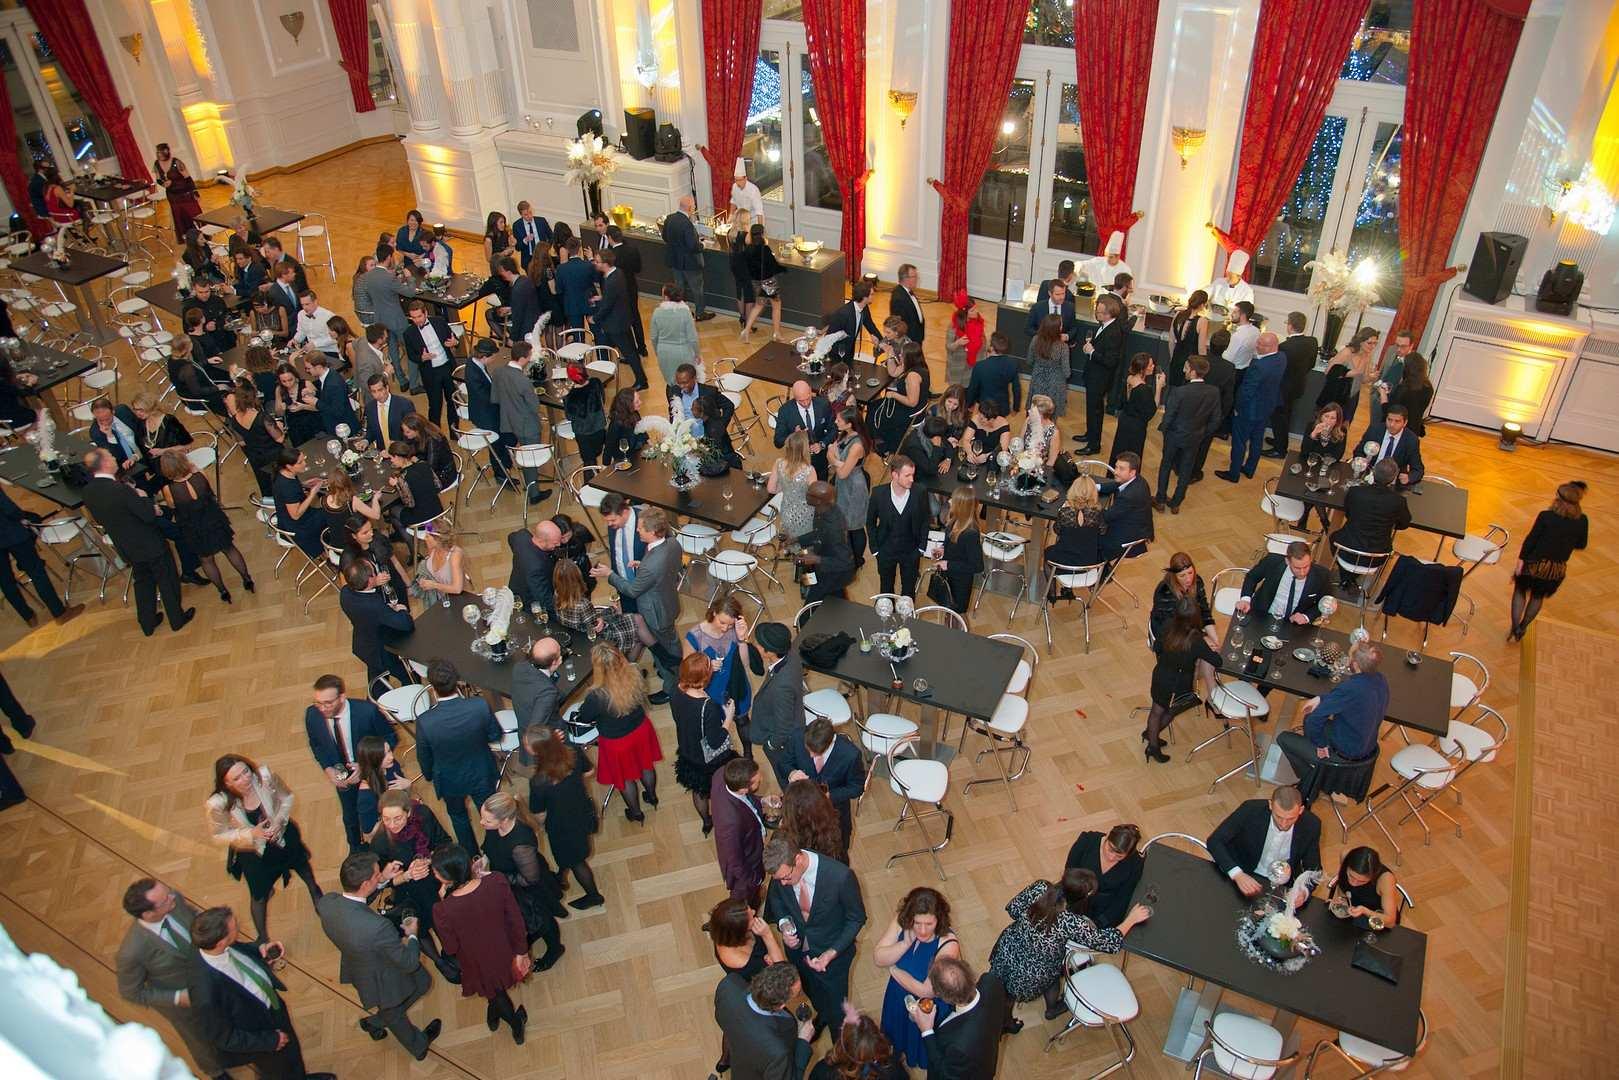 xmas-party-loyens-loeff-2018-carte-blanche-entreprise-lux